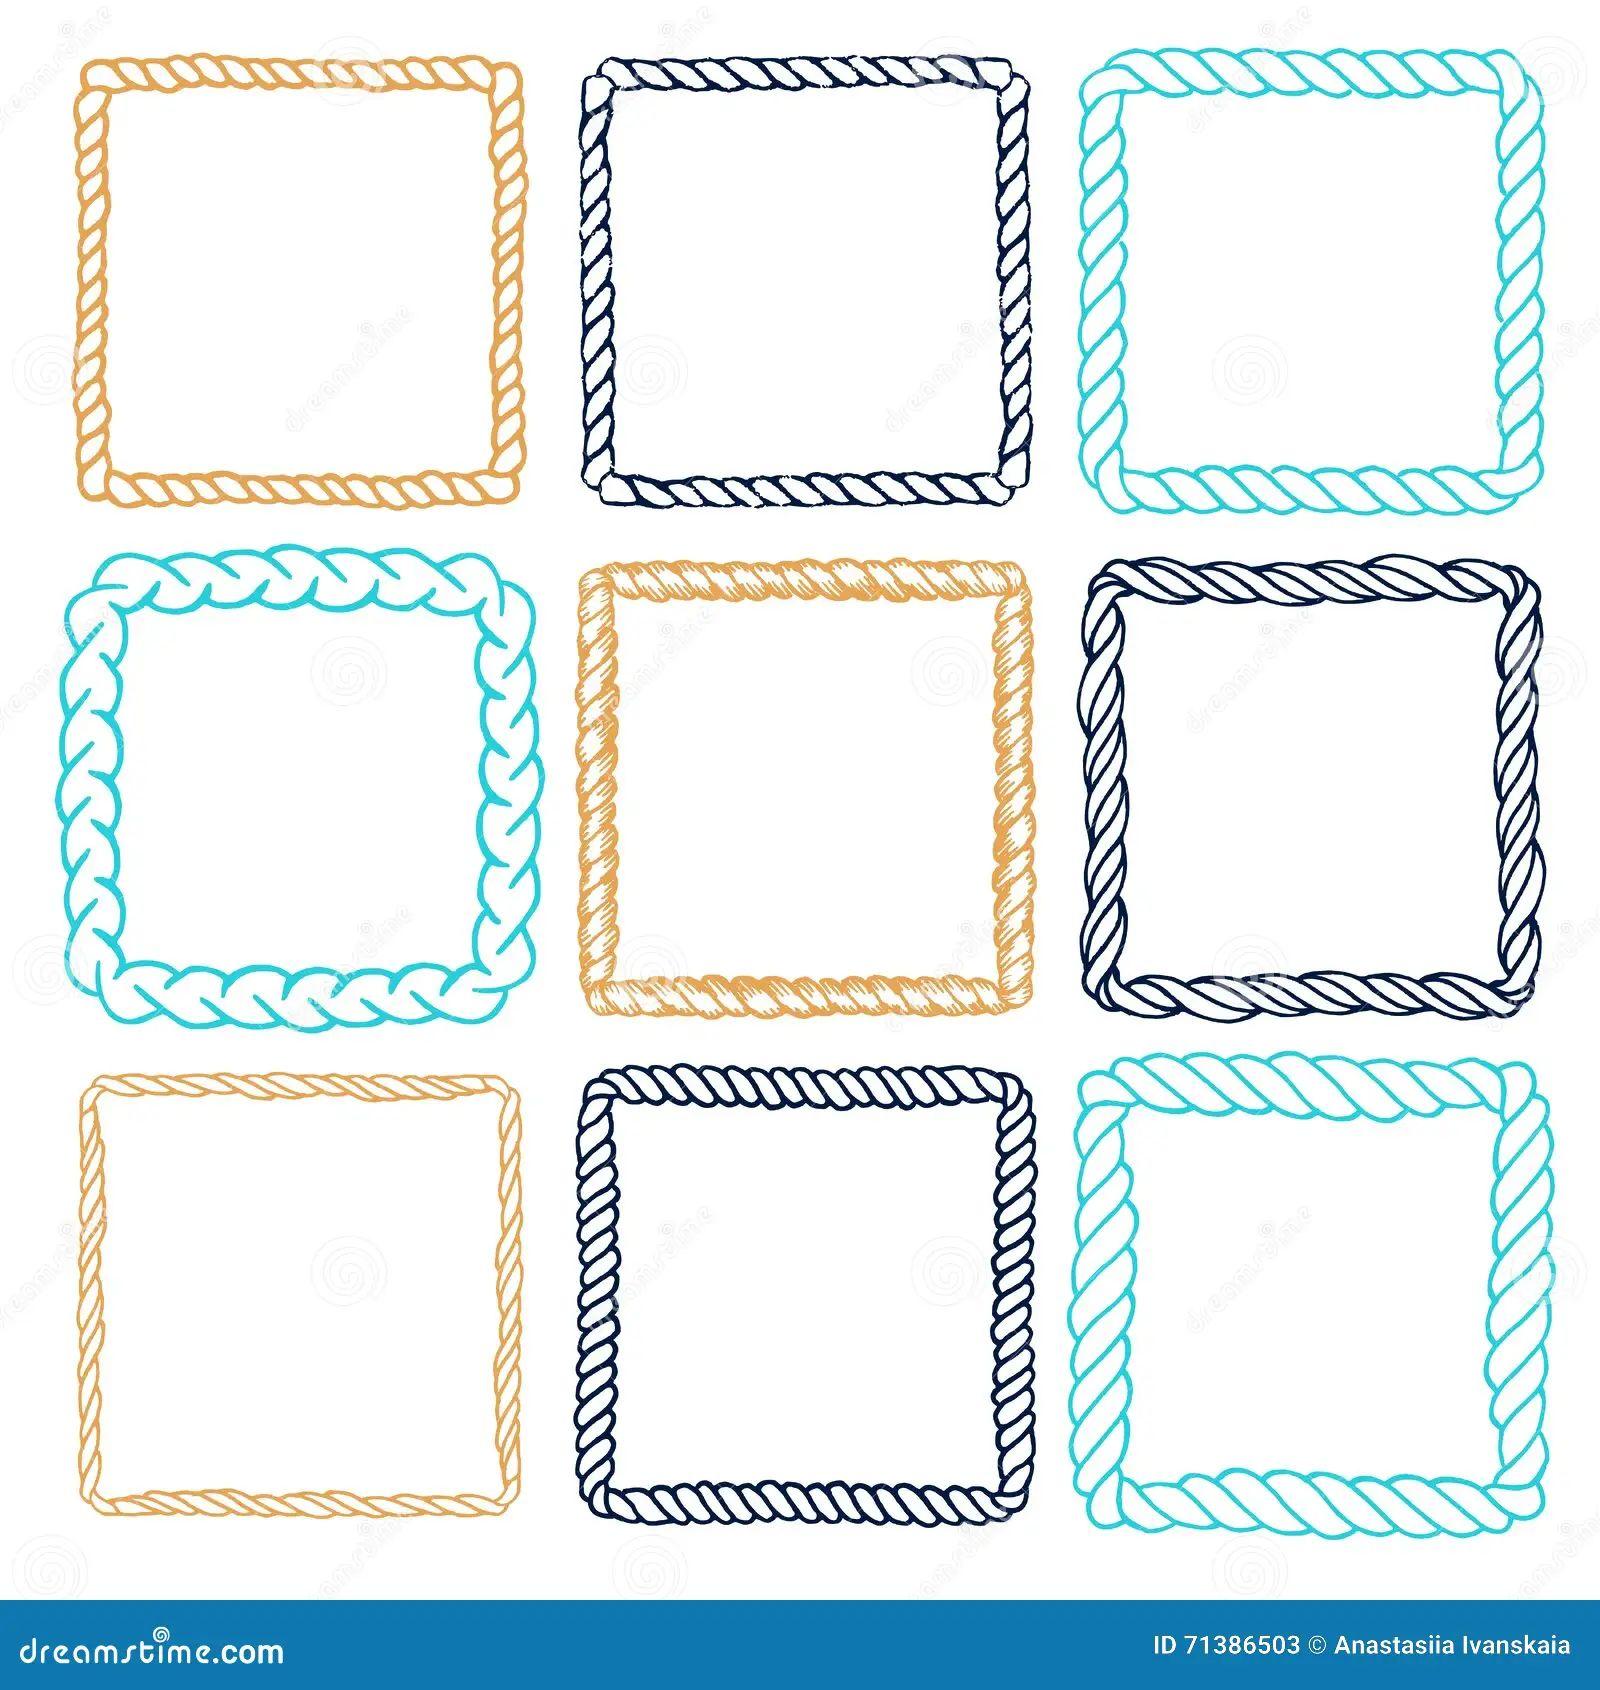 Set of 9 decorative square border frames stock vector